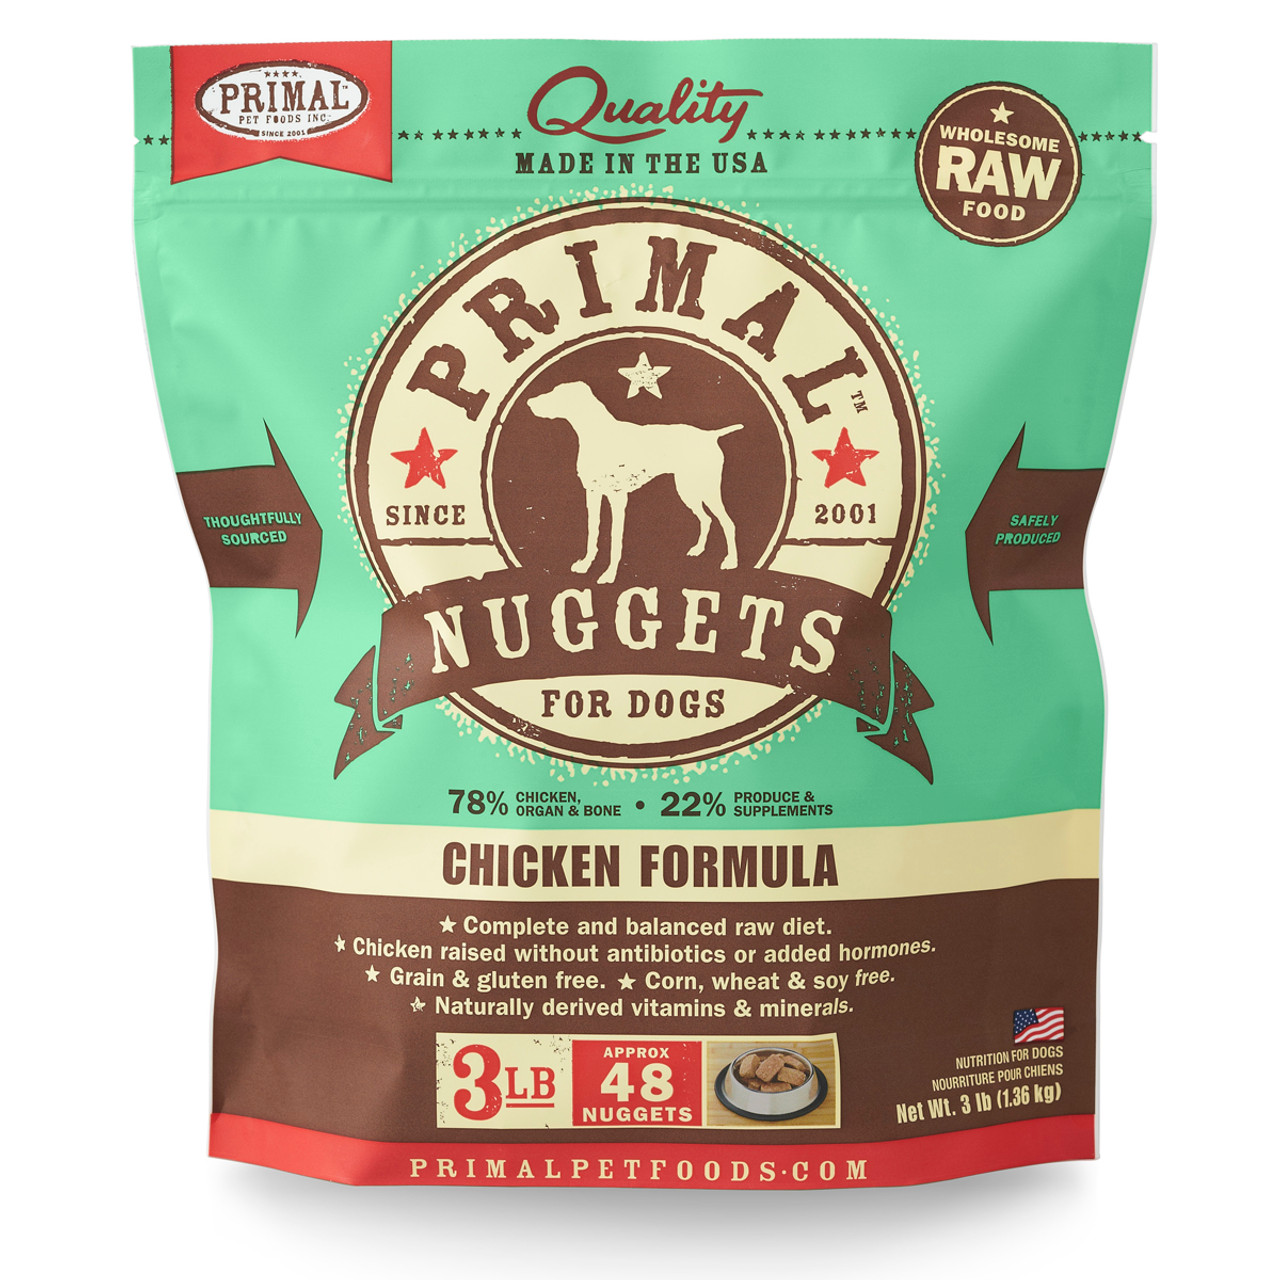 Primal Raw Frozen Canine Nuggets Chicken Formula Dog Food